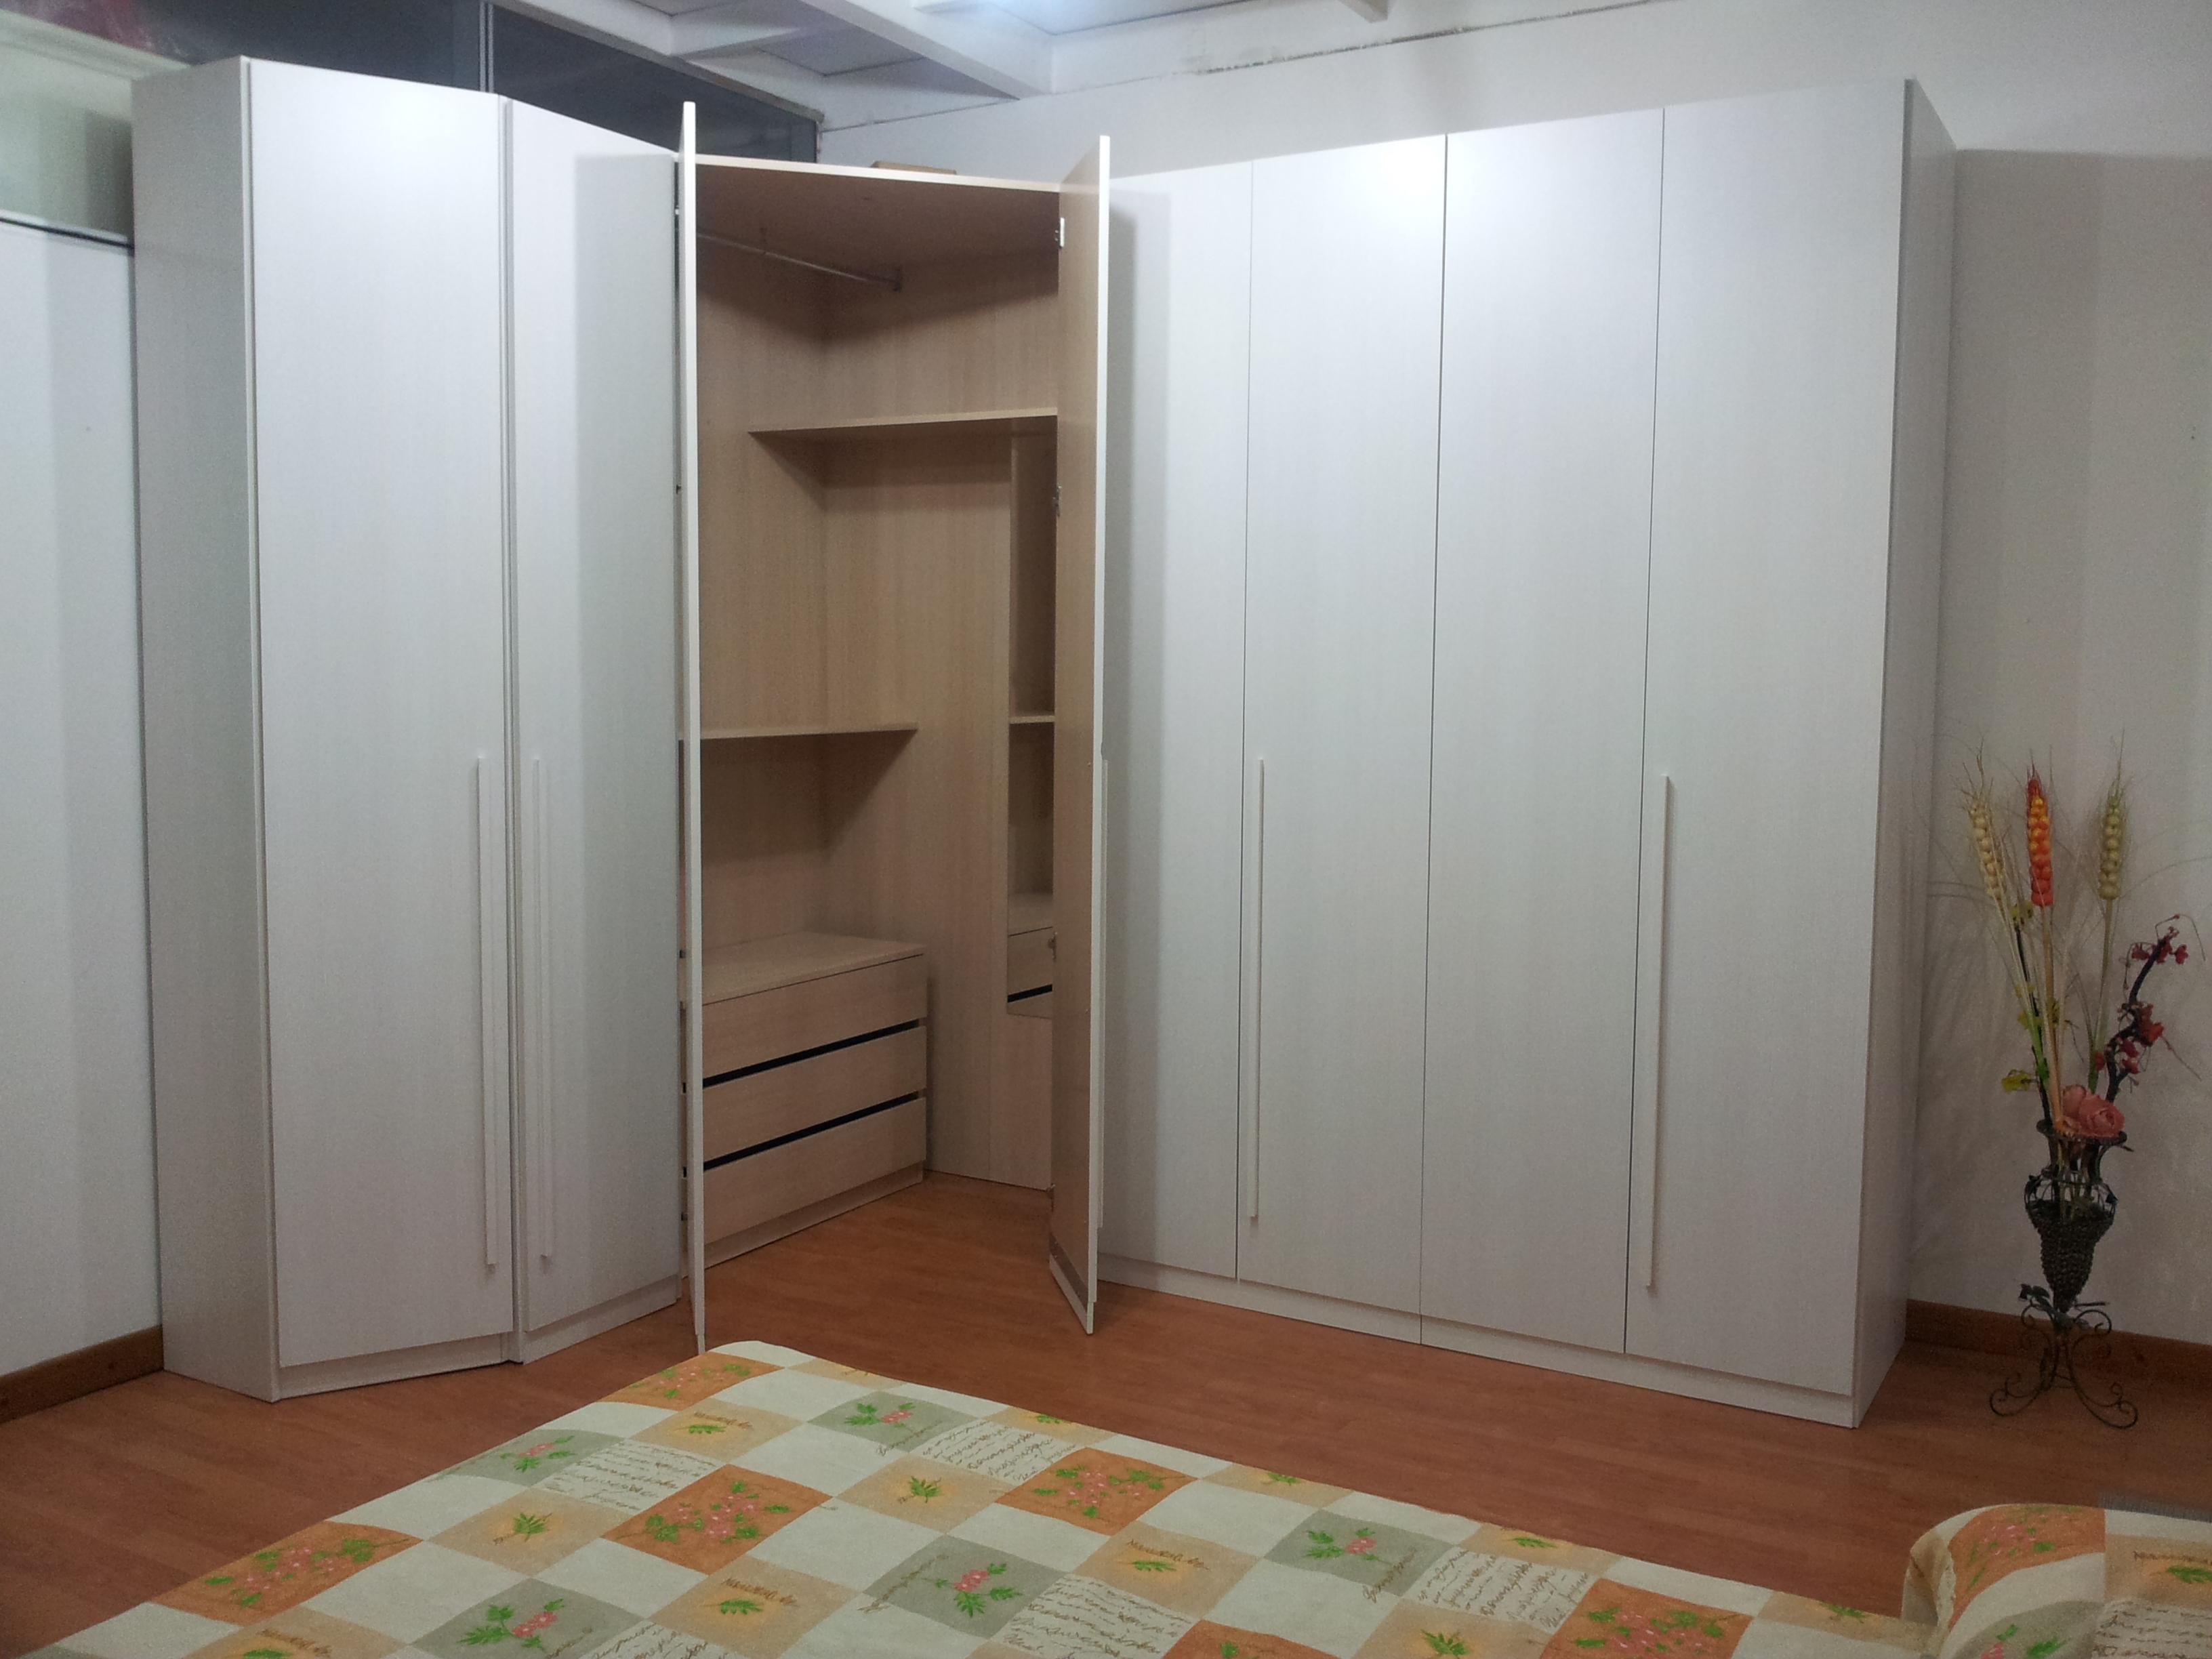 Carrello arredo - Idee cabina armadio ...